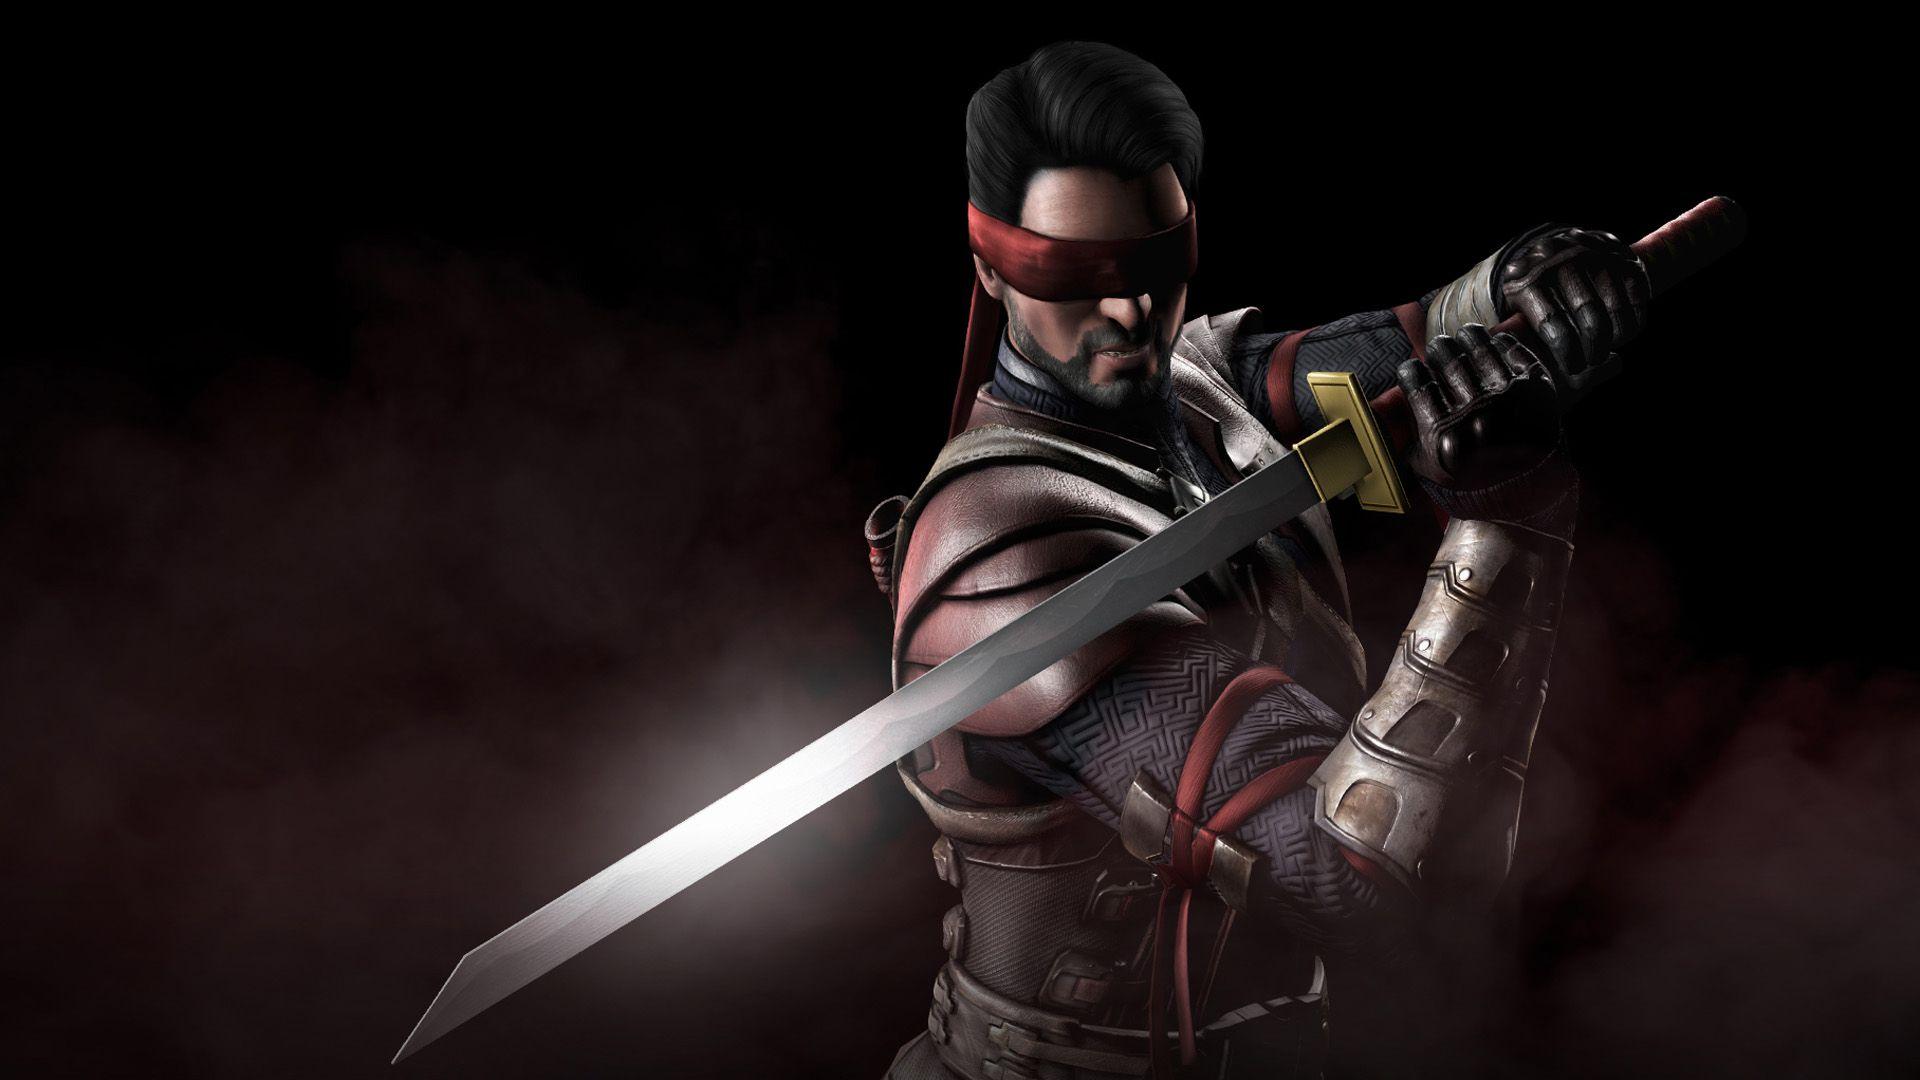 Steam Community Steam Badges Mortal Kombat X Mortal Kombat